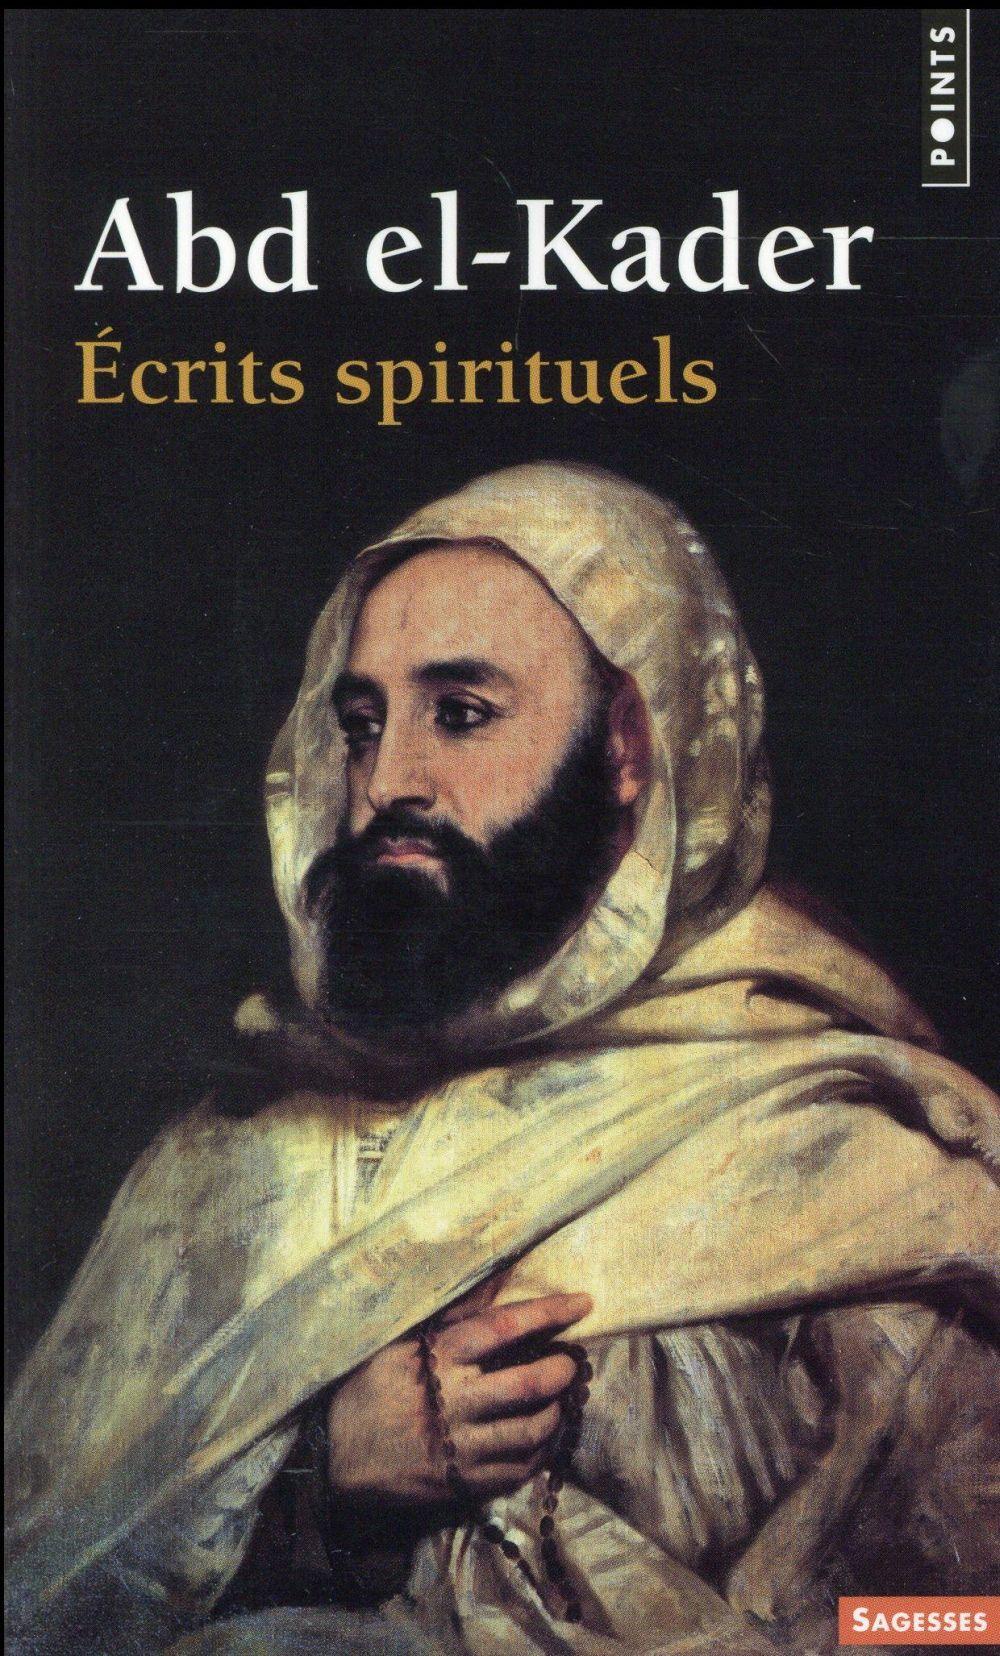 écrits spirituels